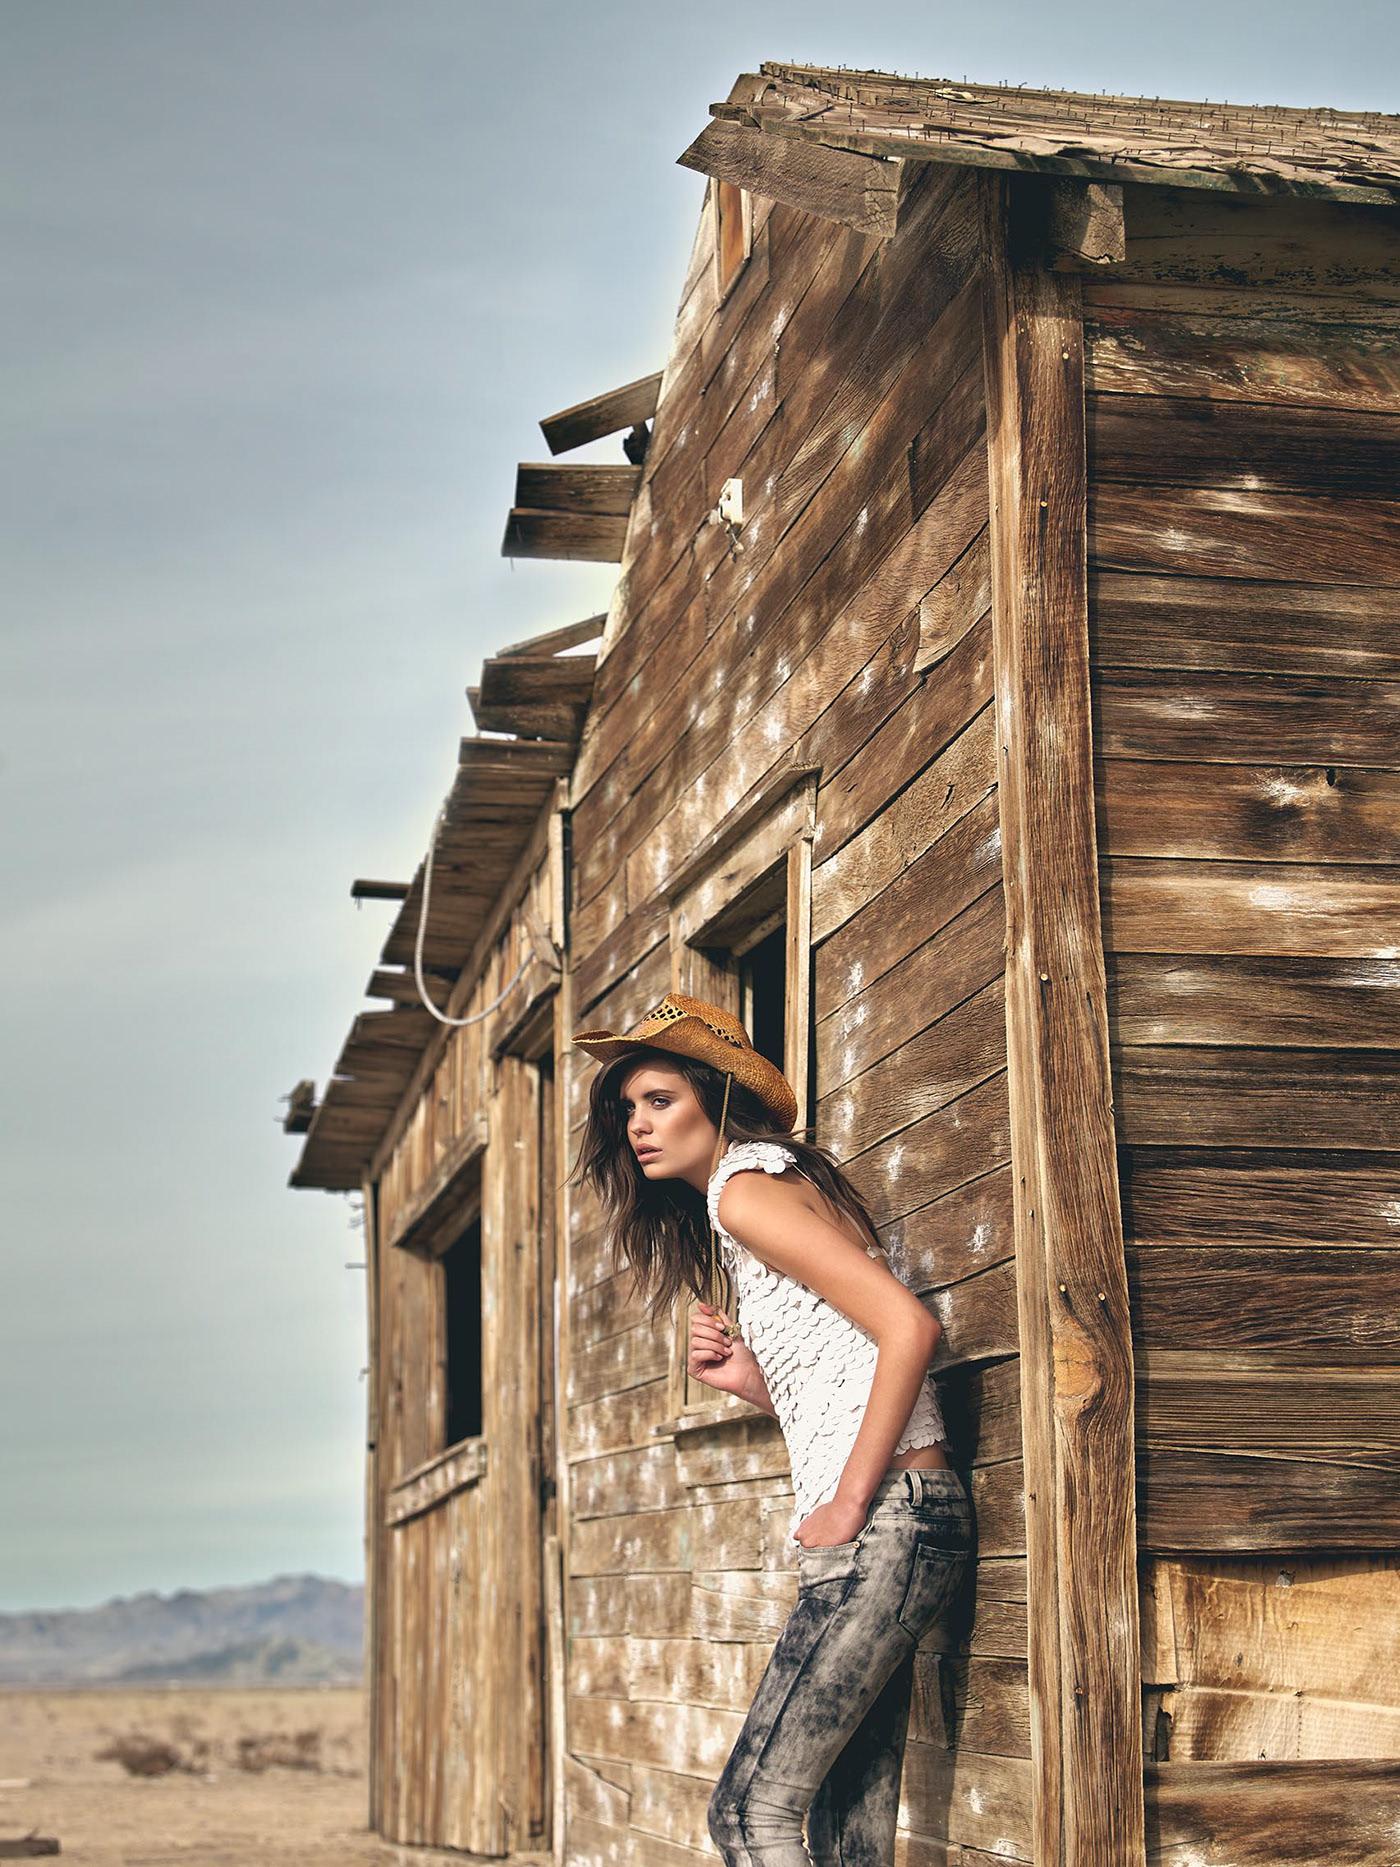 Desert Story / фотограф Henrik Adamsen